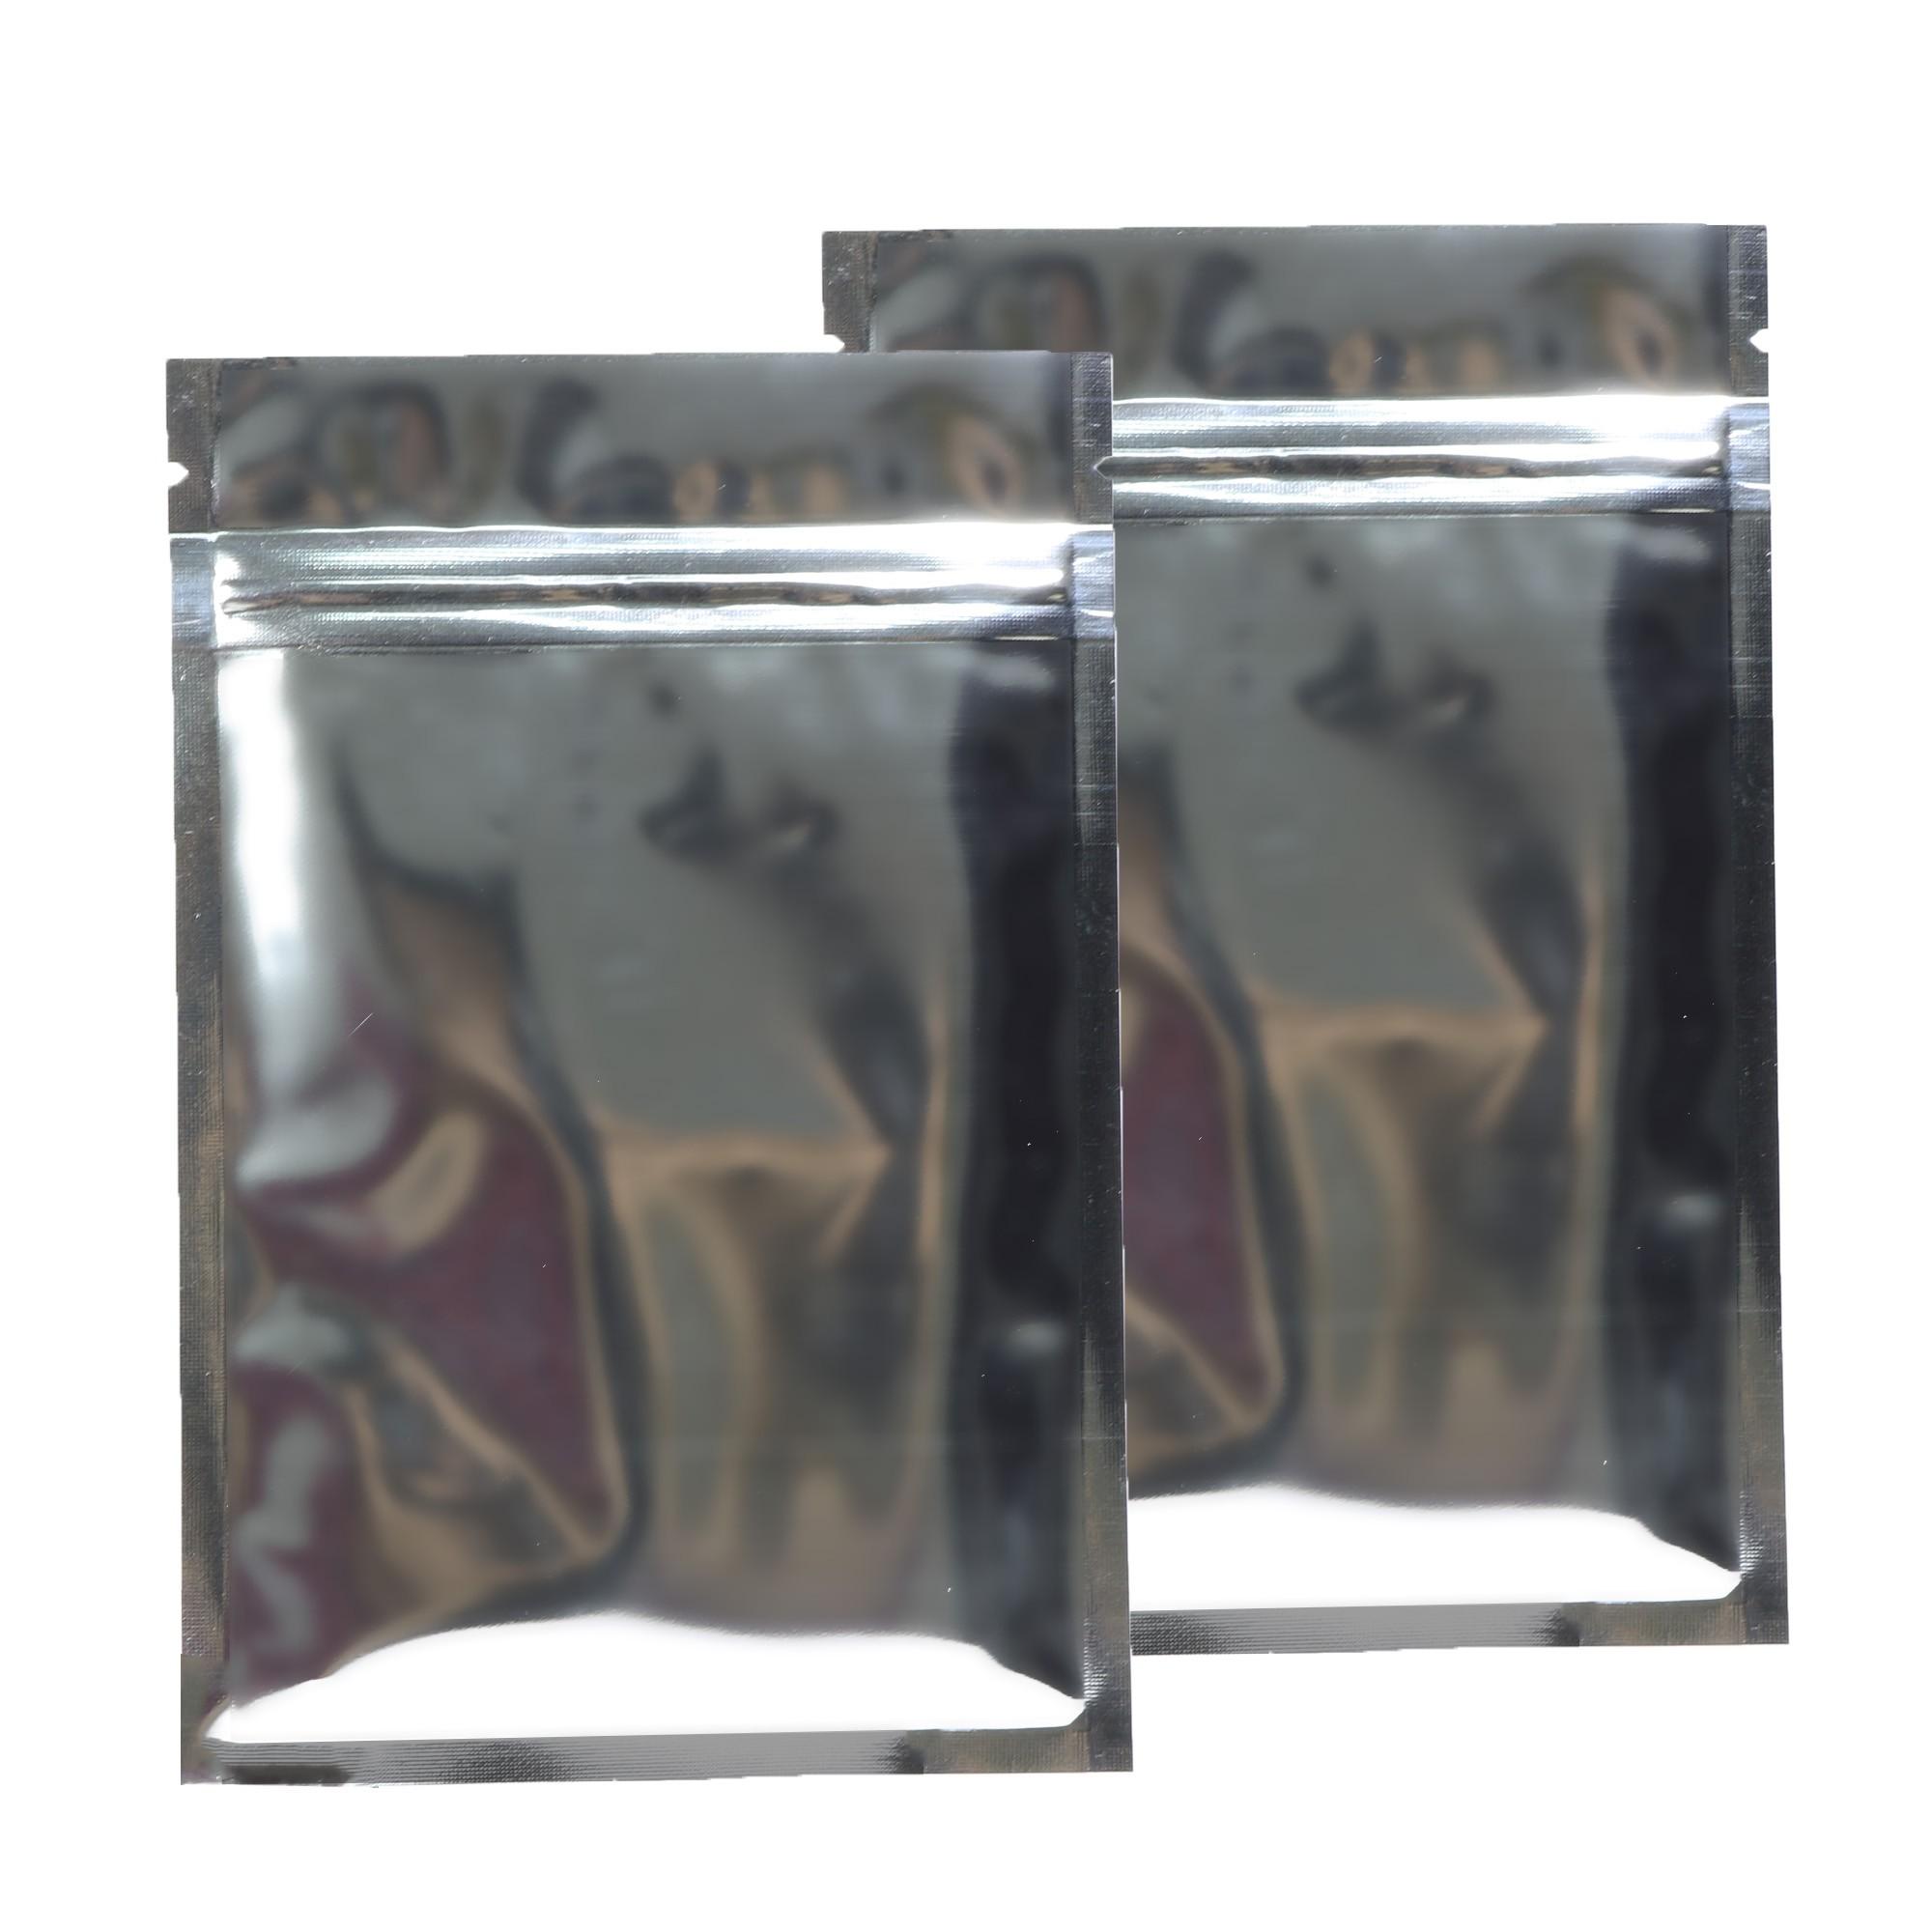 Silver Shiny Metallic Mylar Ziplock Bags 8.5 cm x 13 cm [3.3 inches x 5.1 inches] (500 Bags/Lot)